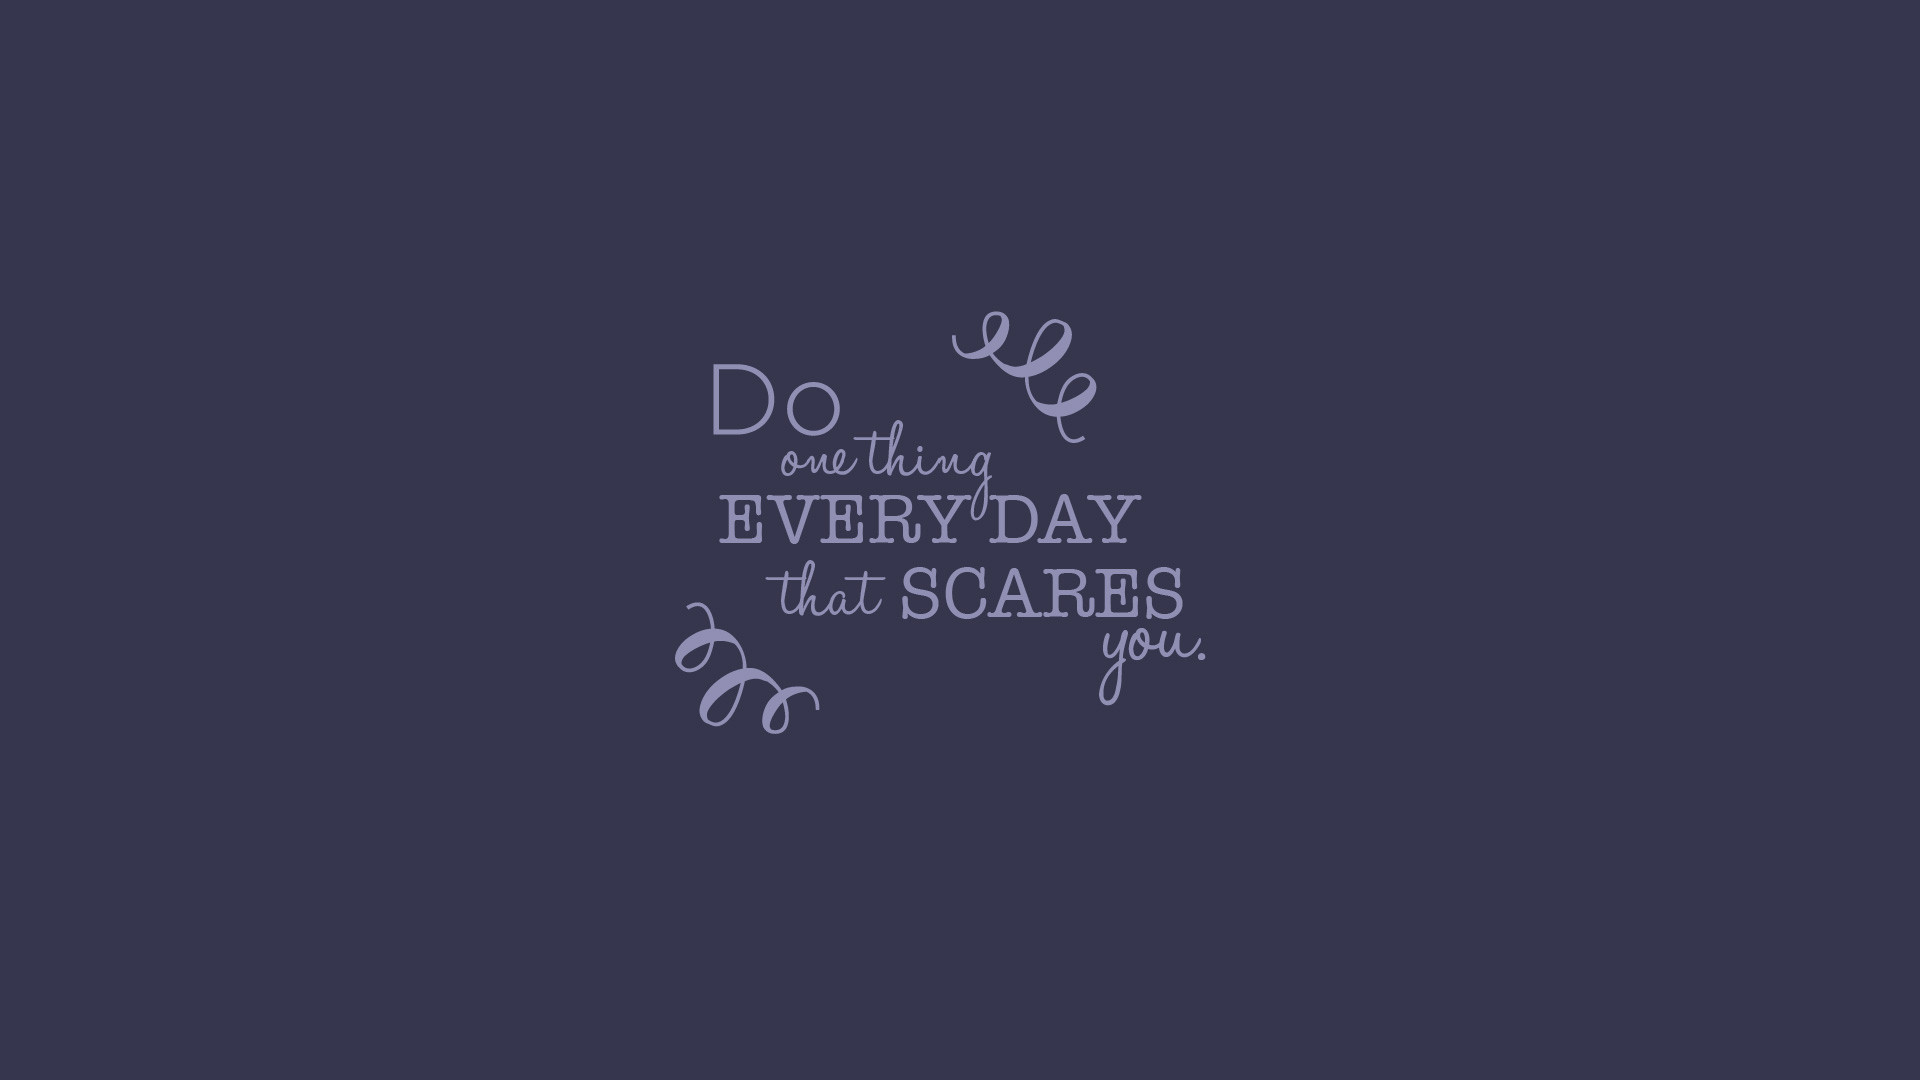 Res: 1920x1080, Motivational-wallpaper-quotes-16 115 Best Motivational Wallpaper Examples  with Inspiring Quotes